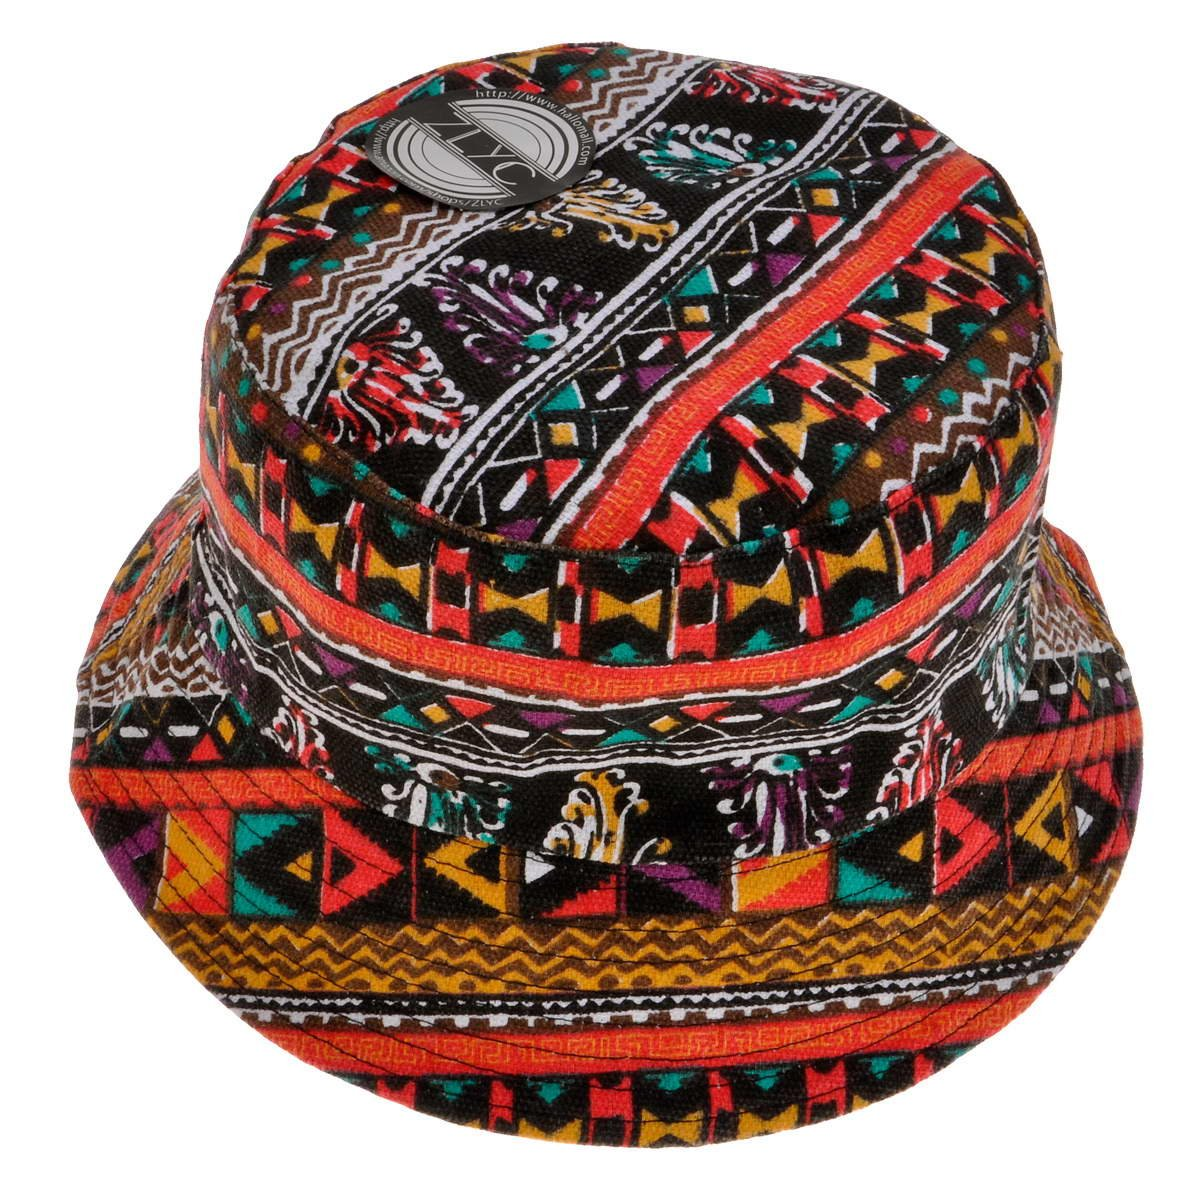 ZLYC Fashion Tribal Bucket Hat Summer Fisherman Cap For Women Men Teens, Red ZYJ-MZ-093-RD